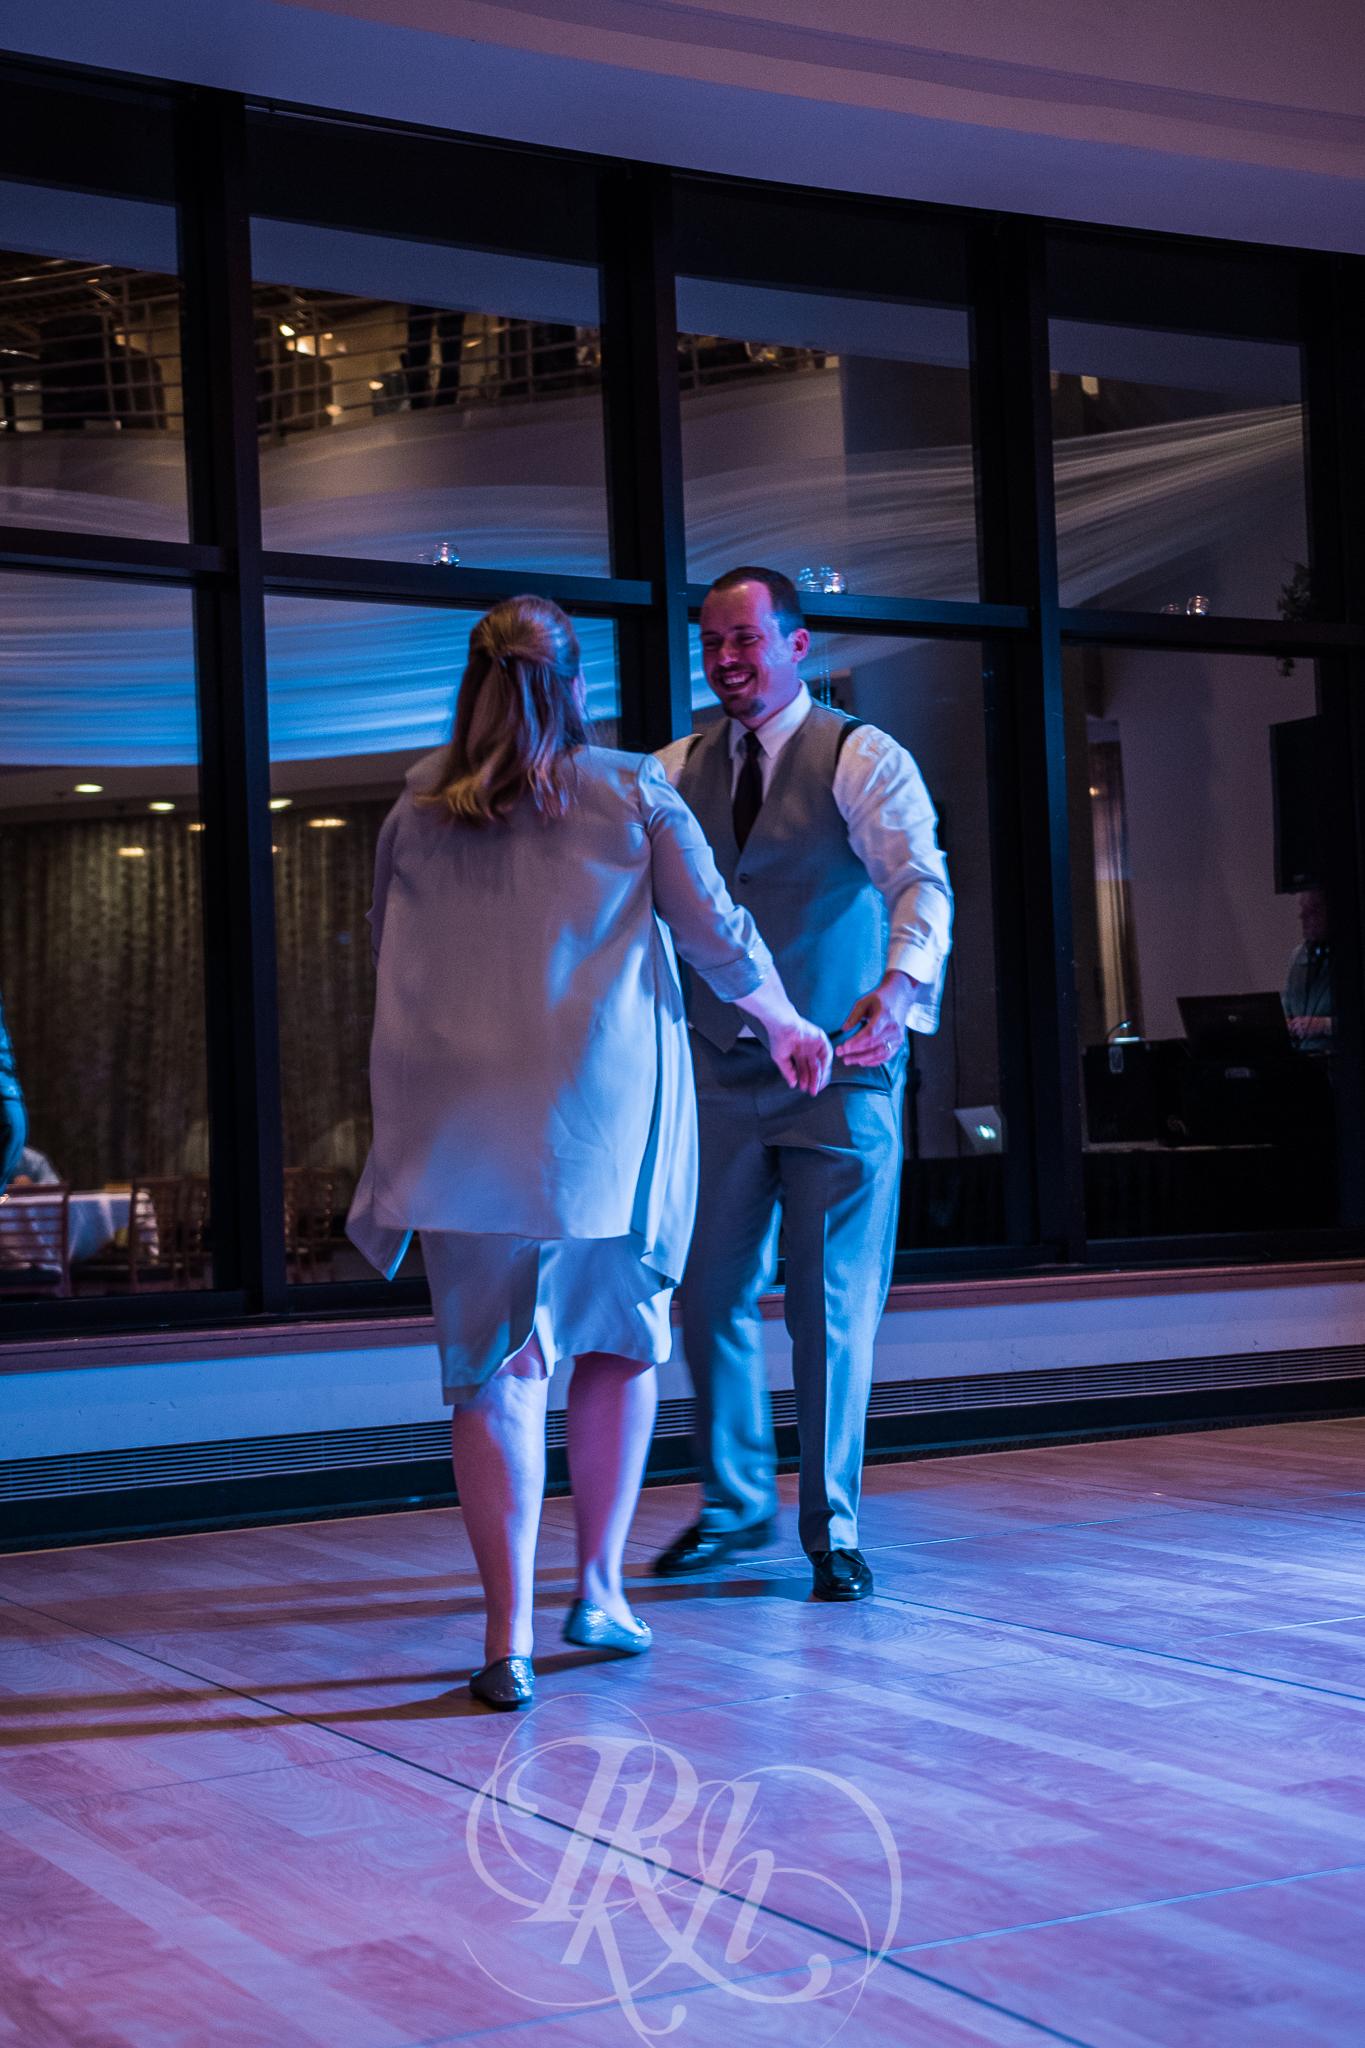 Jackie & Corey - Minnesota Wedding Photography - RKH Images -25.jpg